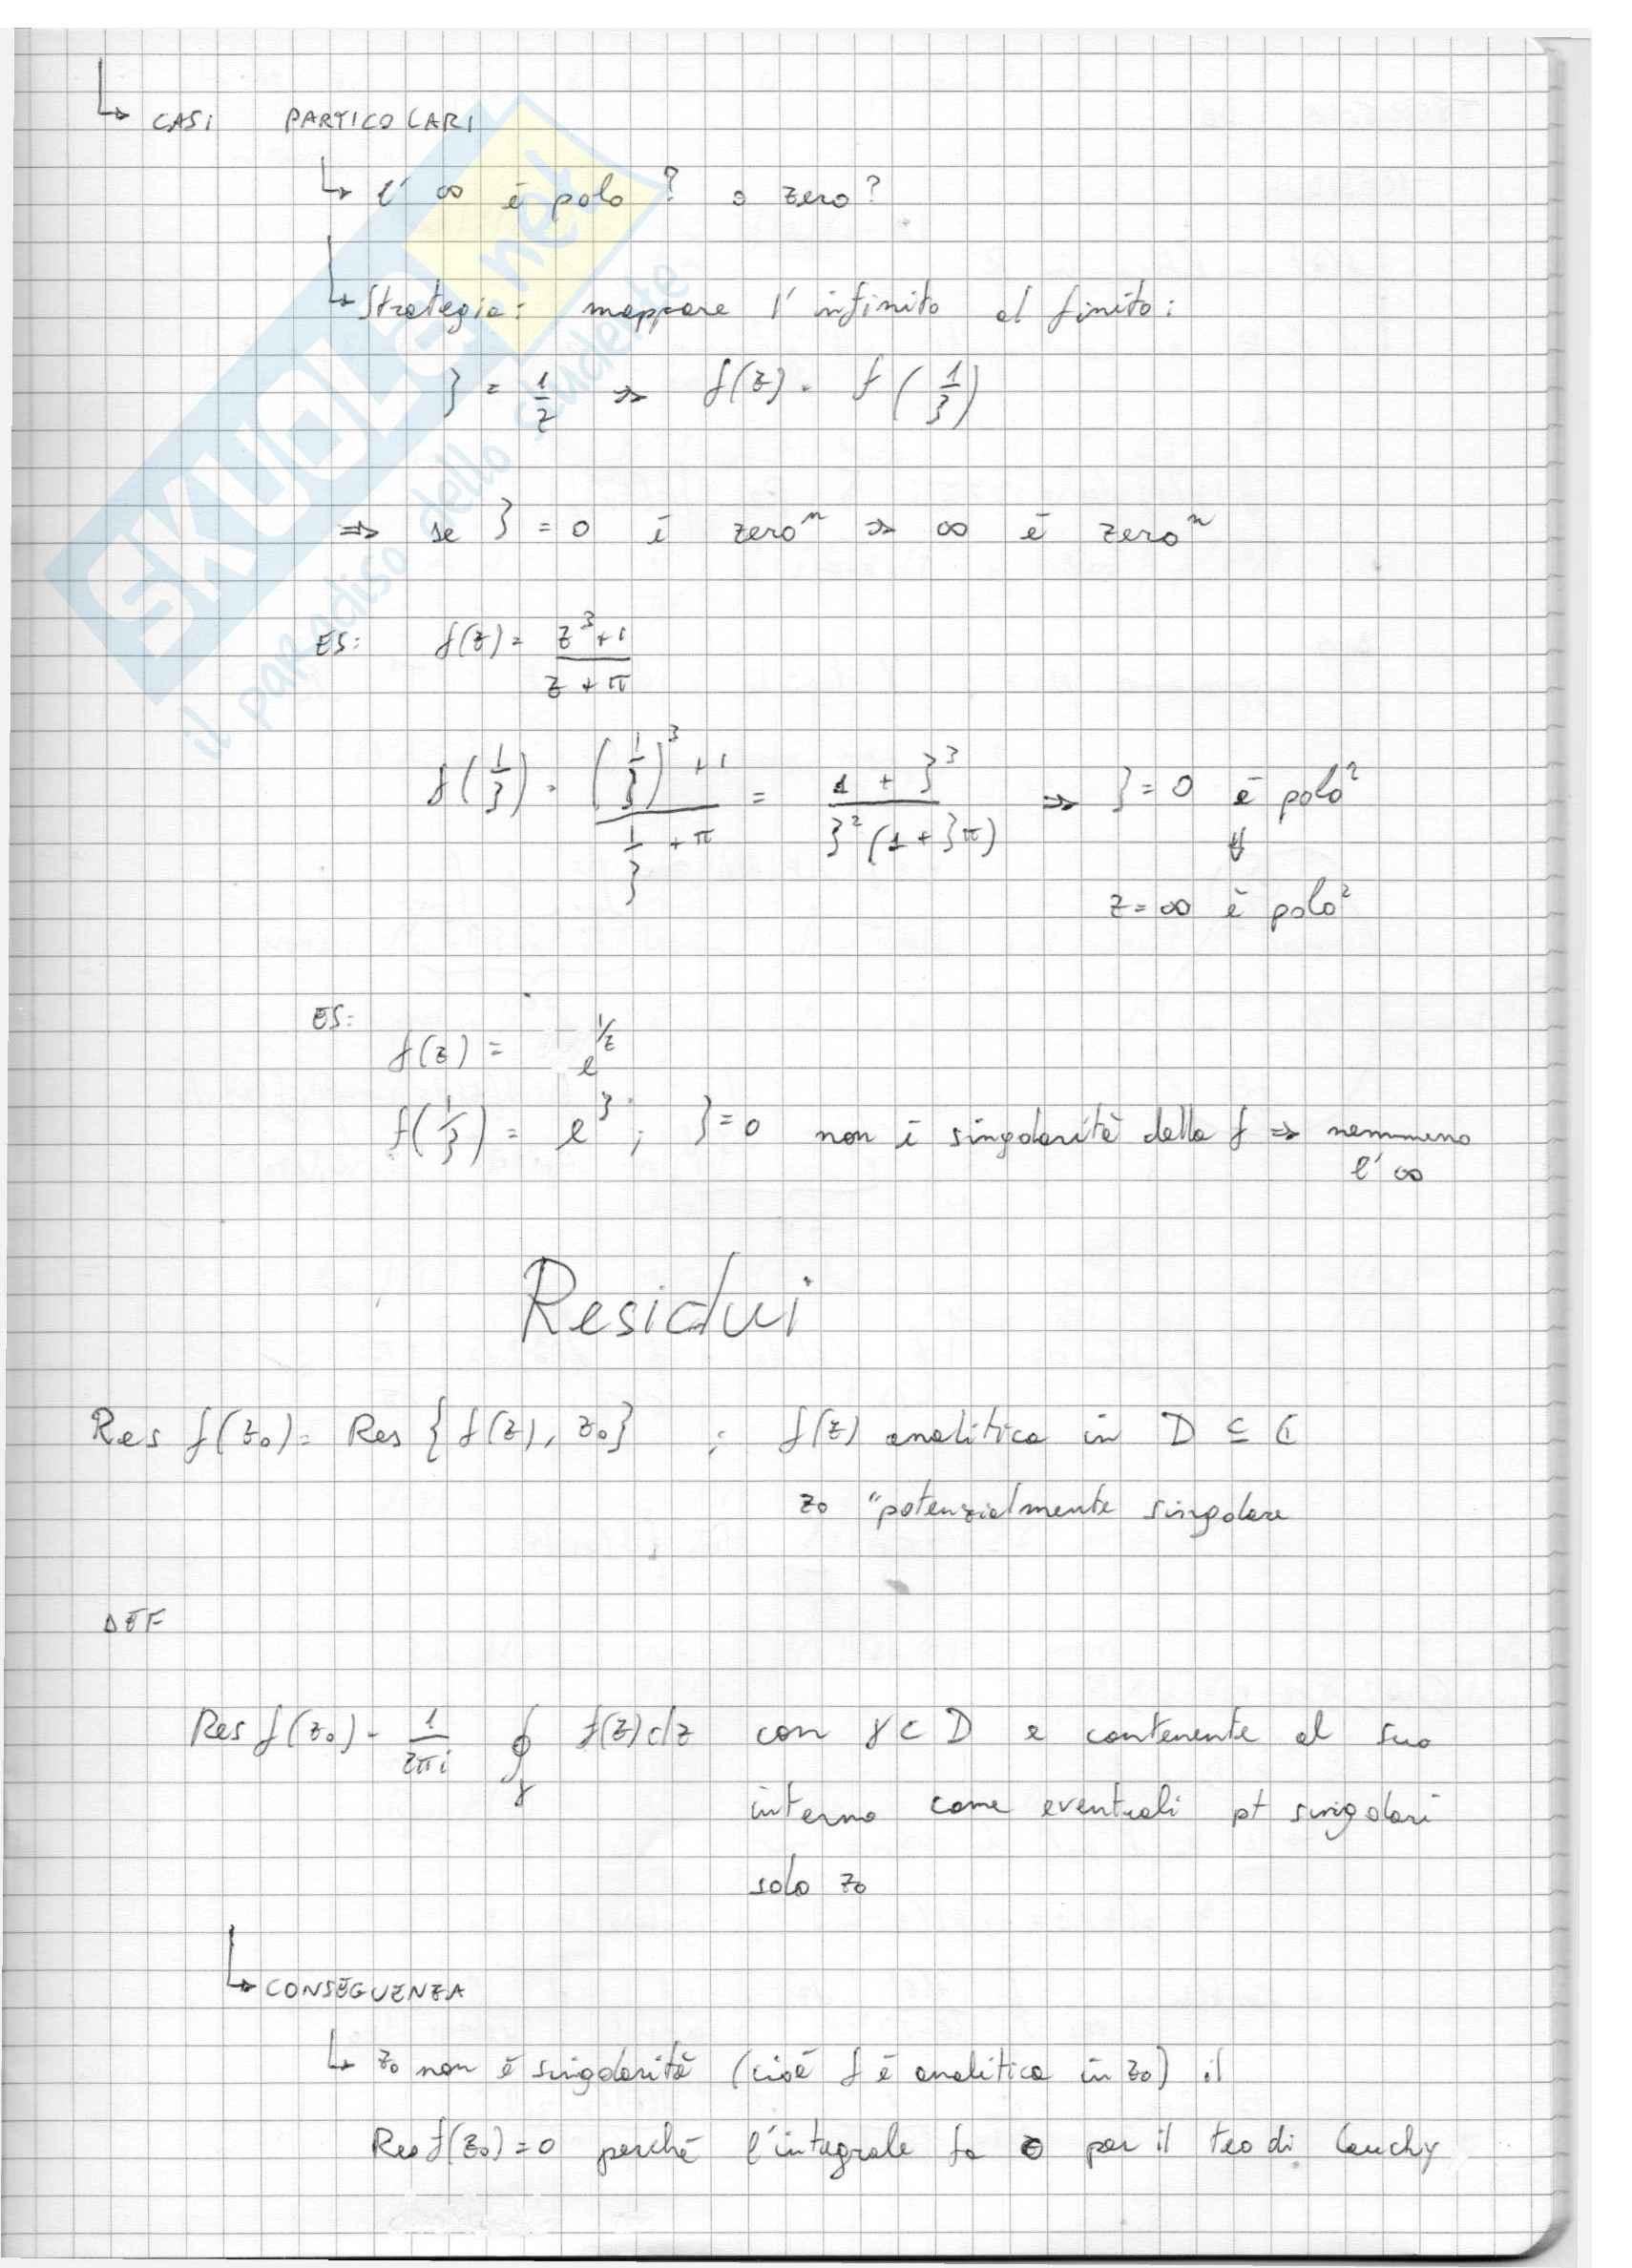 Fisica Matematica Pag. 36